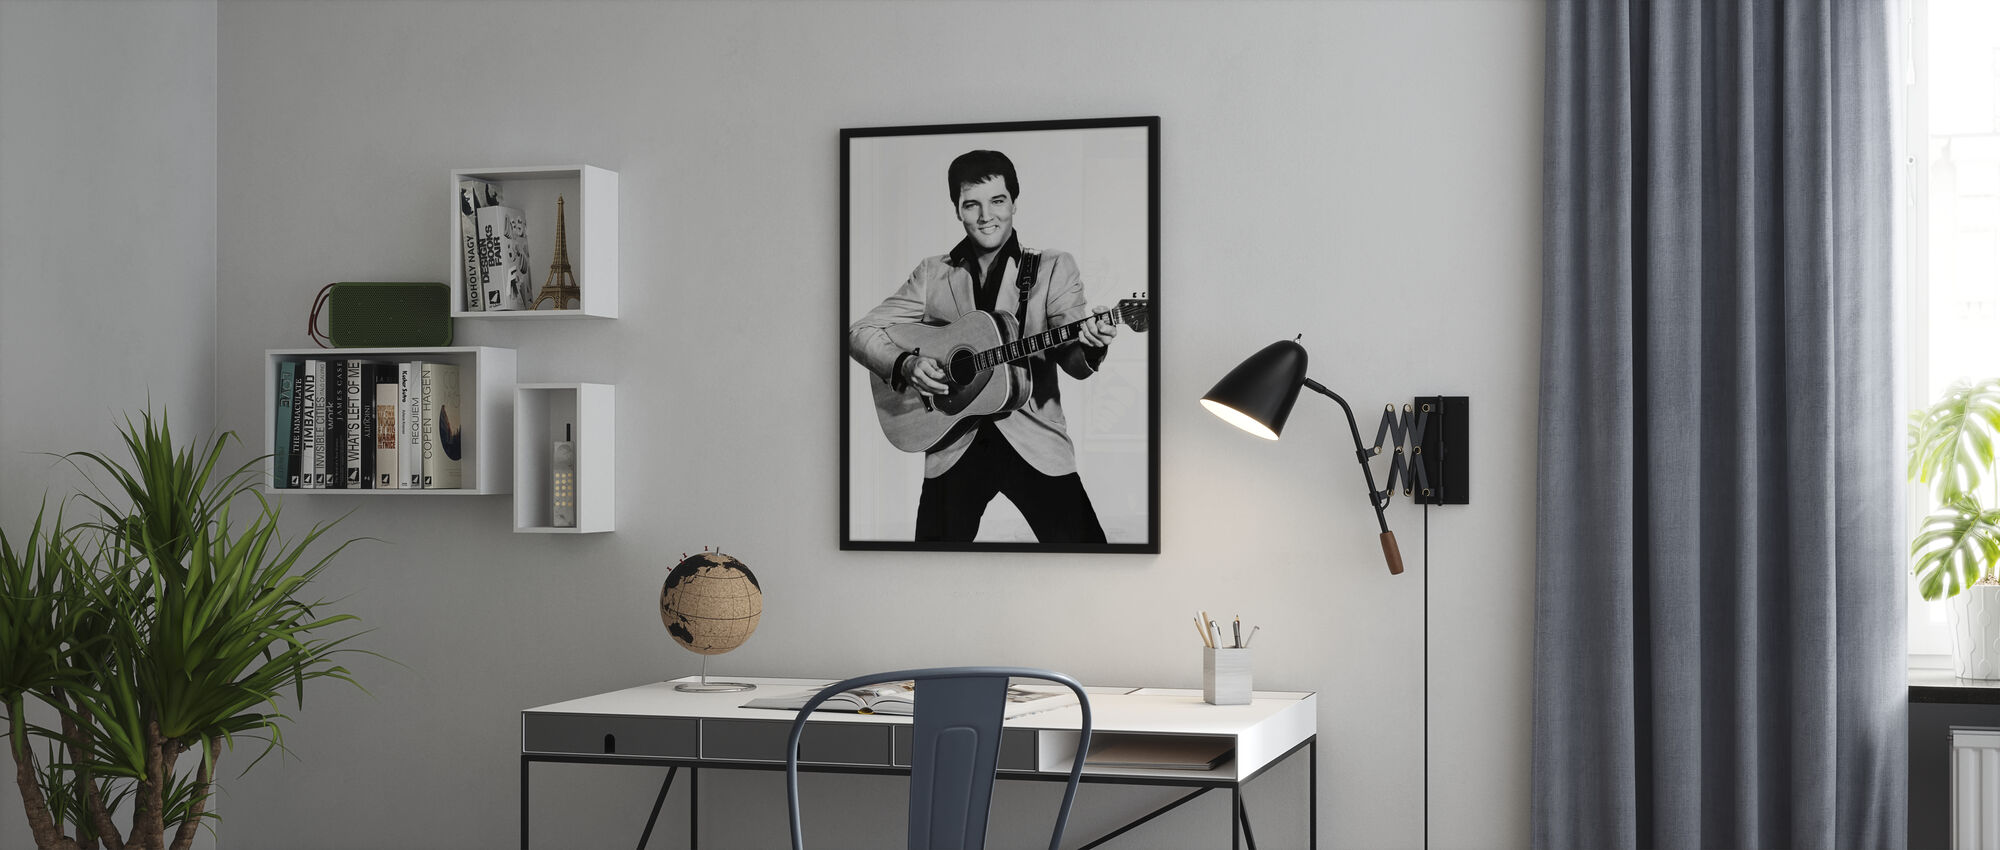 Der König der 60er Jahre - Gerahmtes bild - Büro